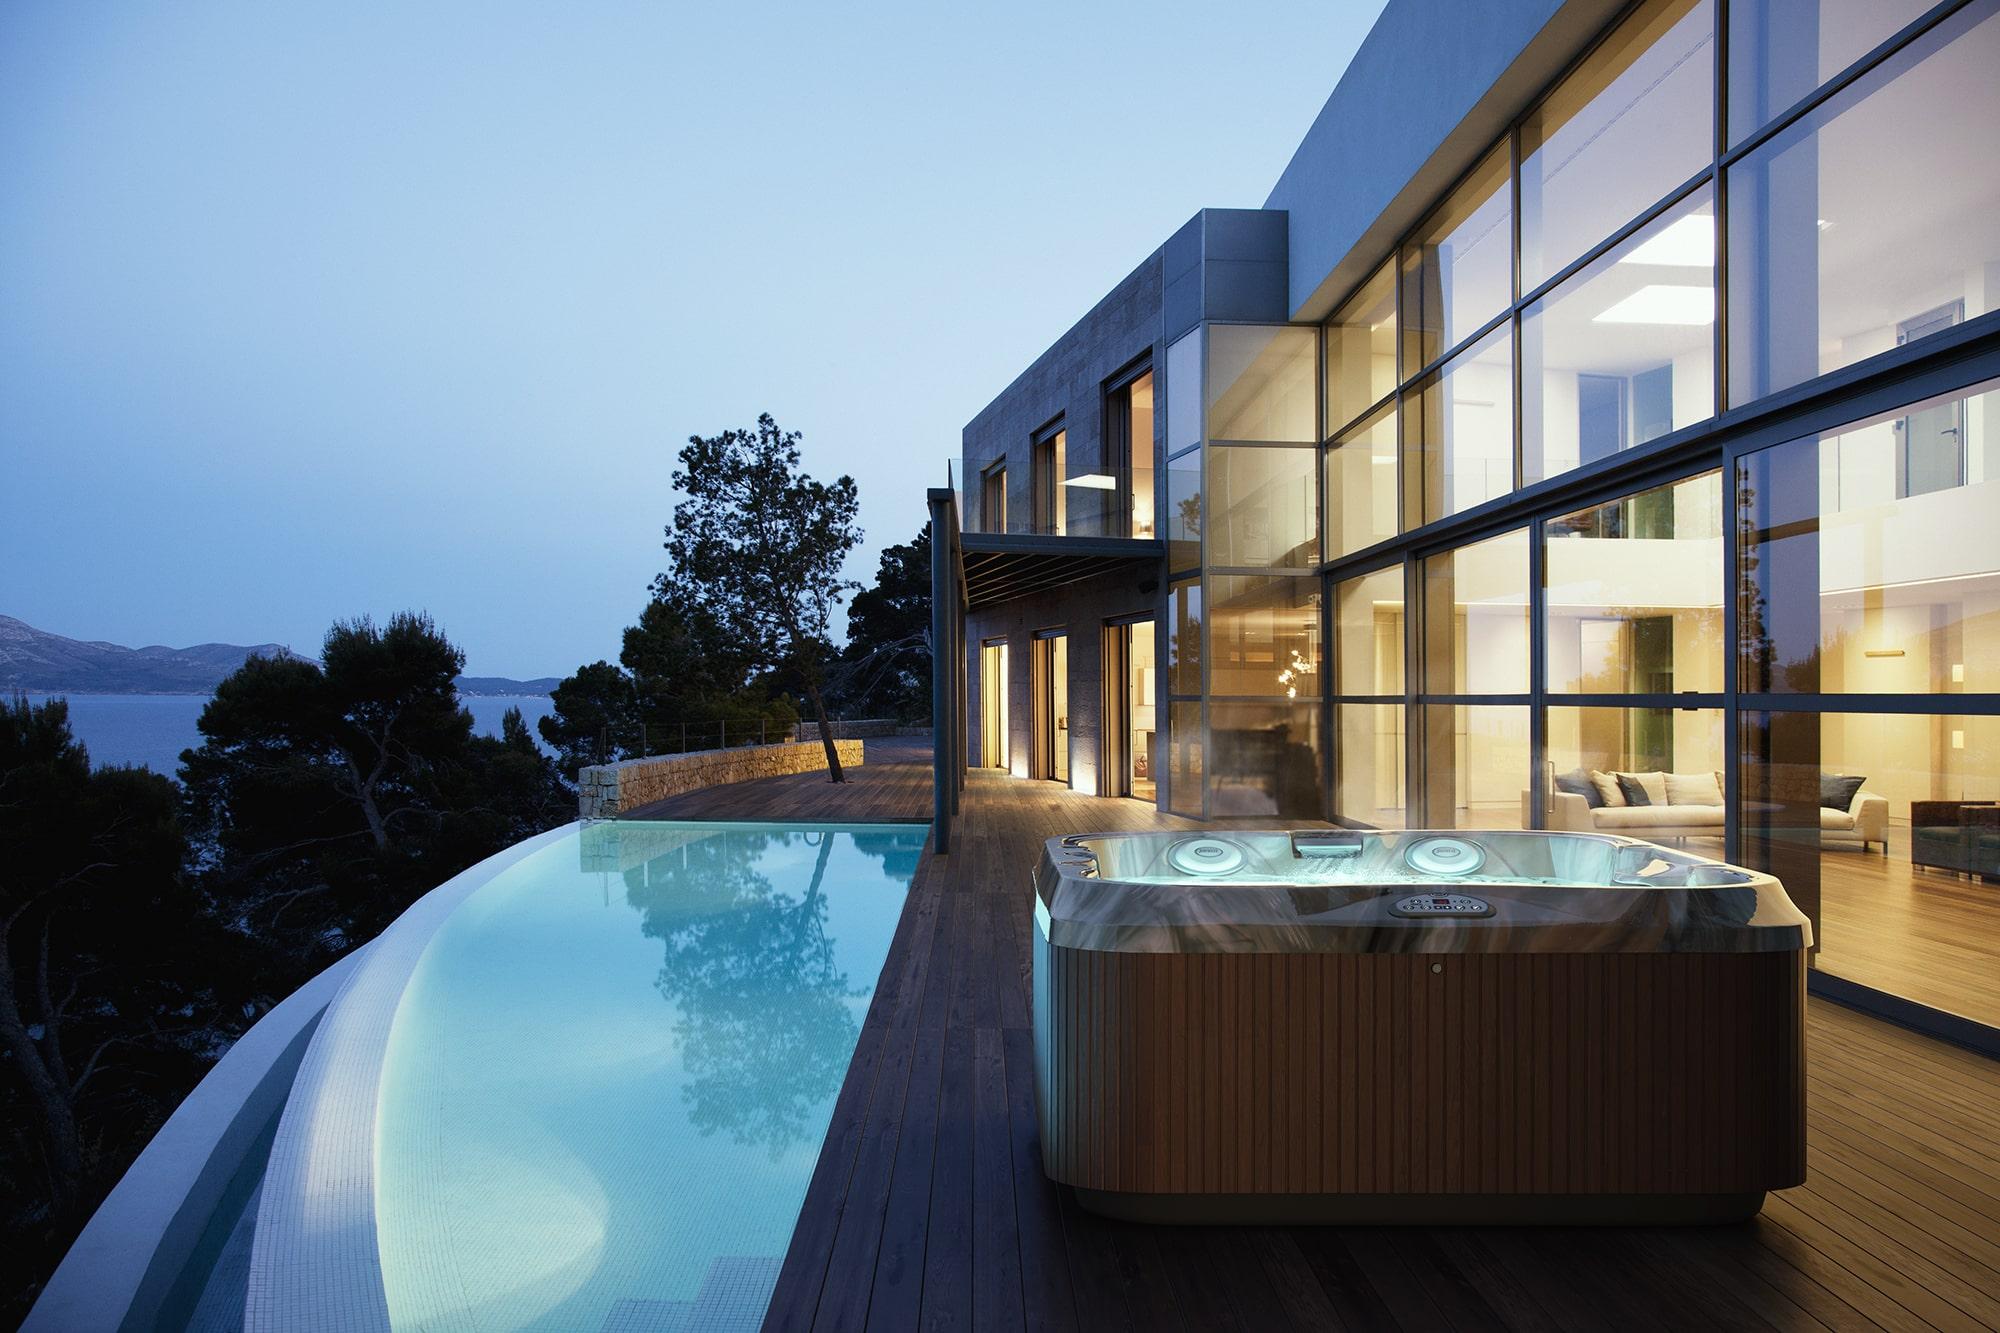 jacuzzi hot tub luxury installation in Hurricane, Utah